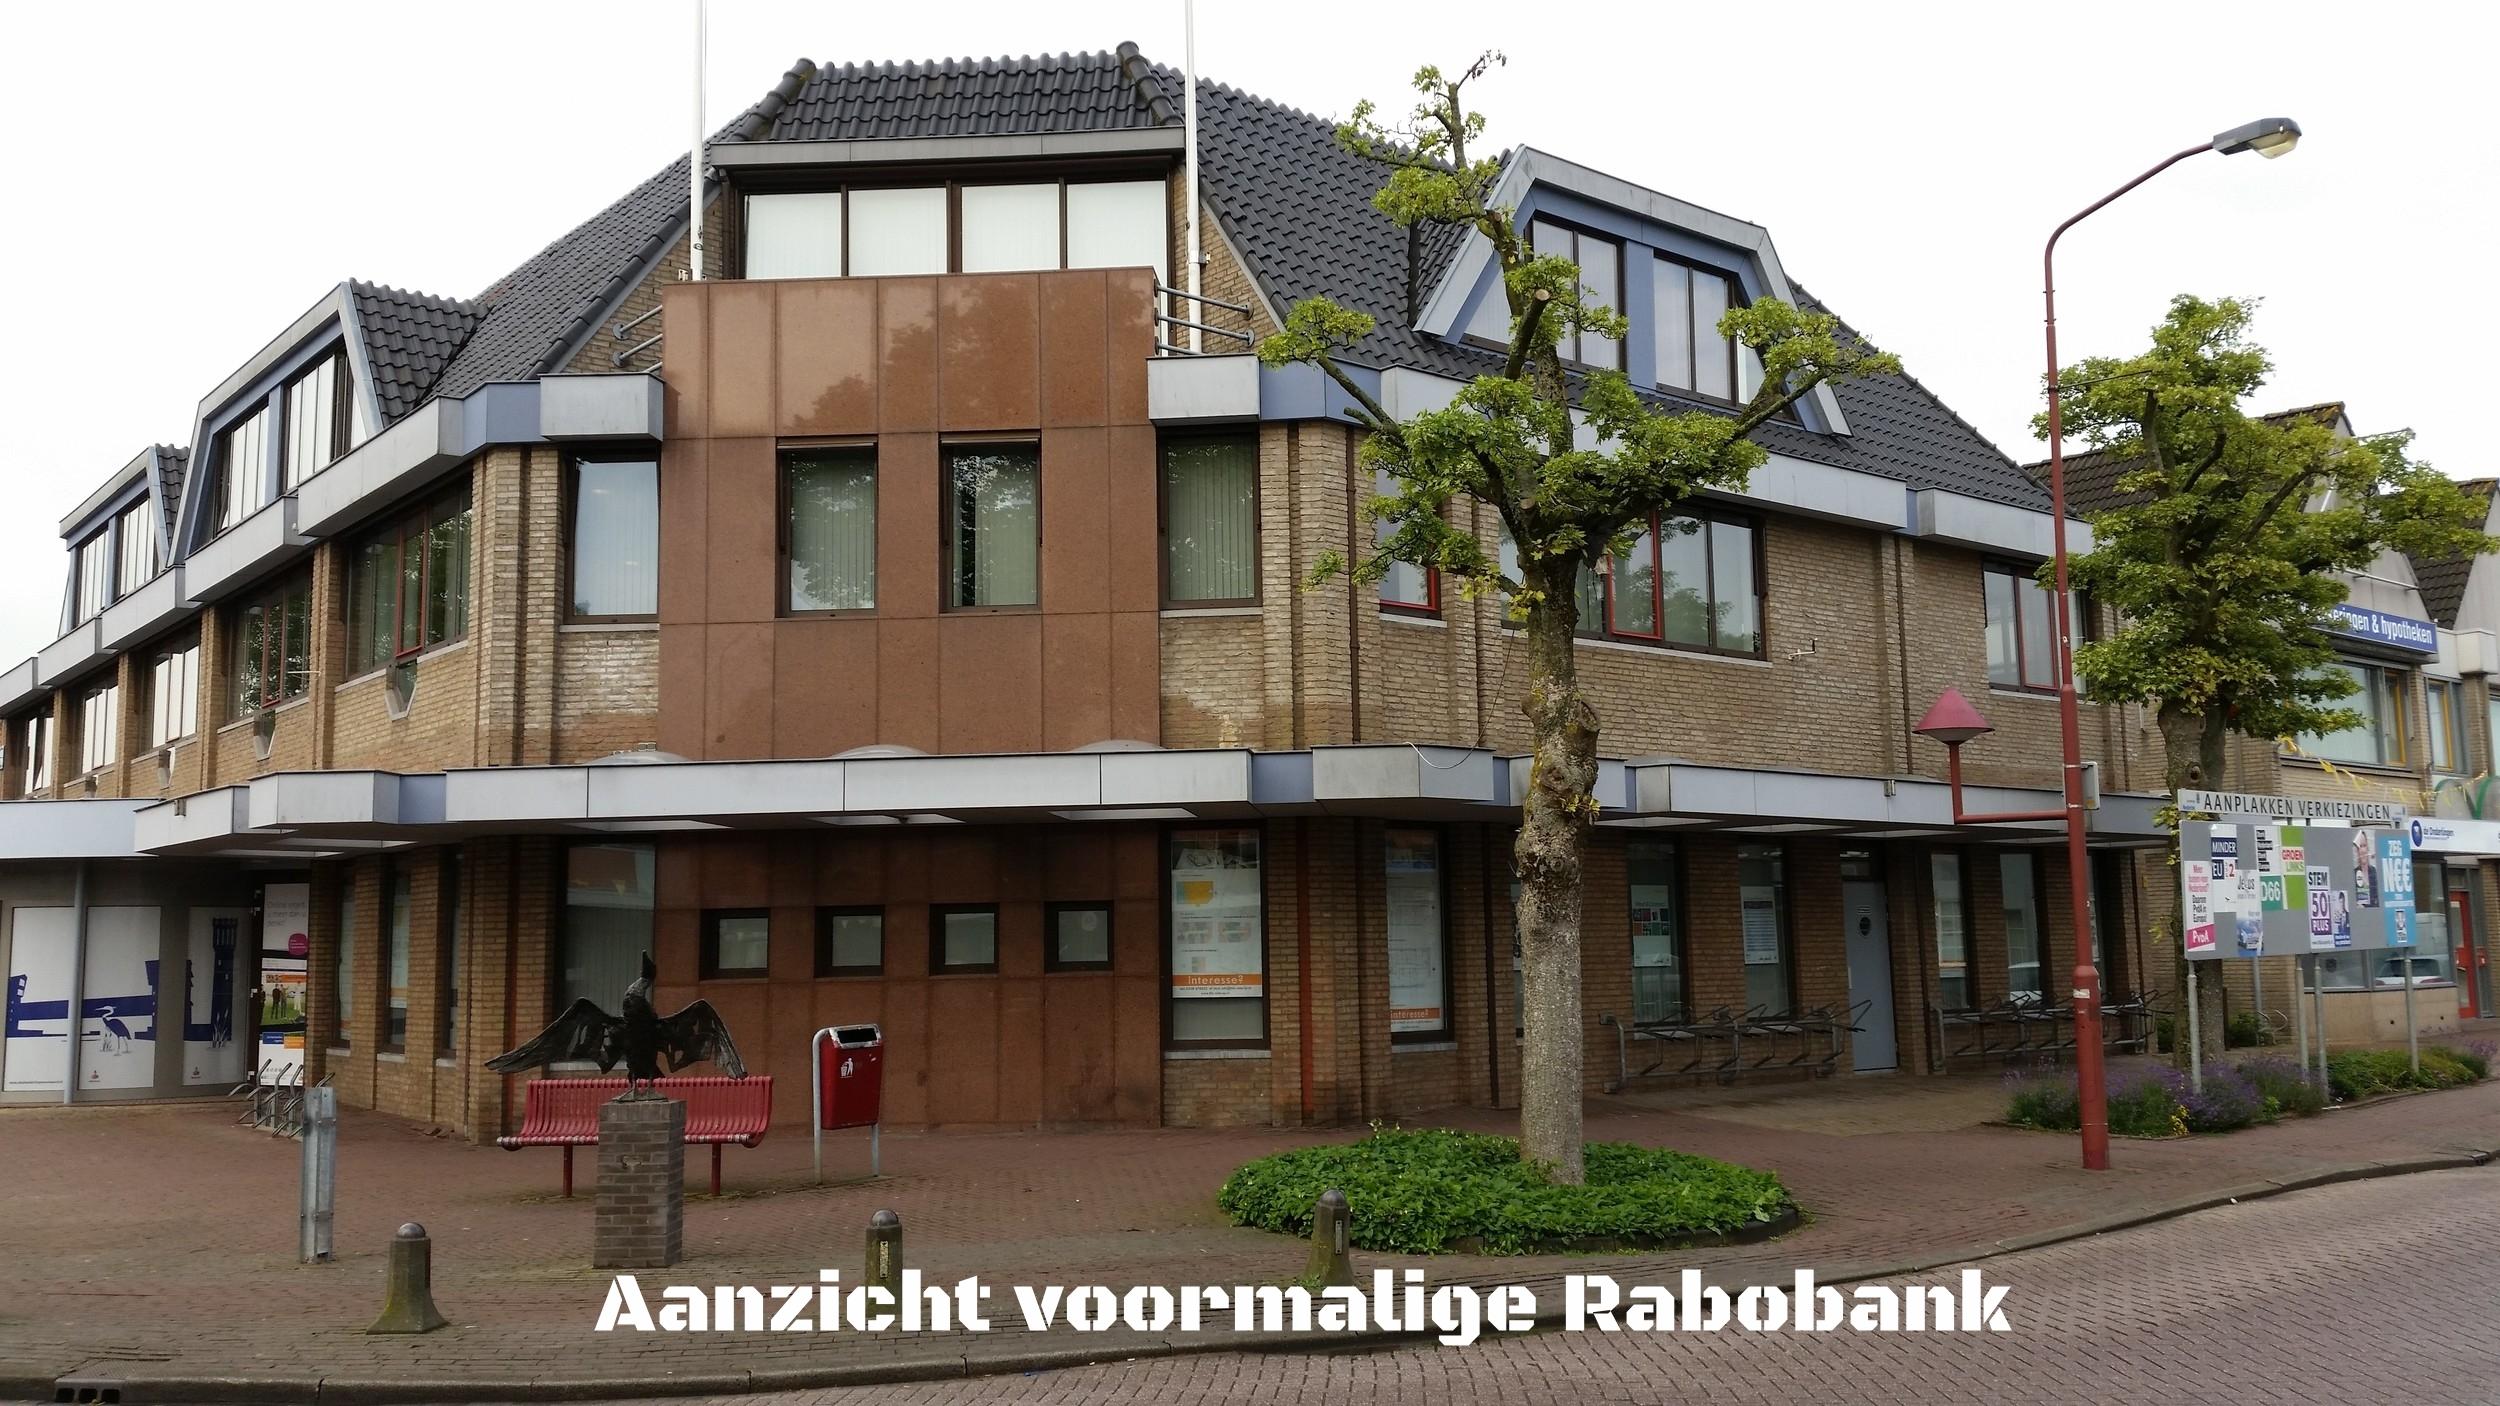 t.004 - kerkweg - 140611  (5).jpg